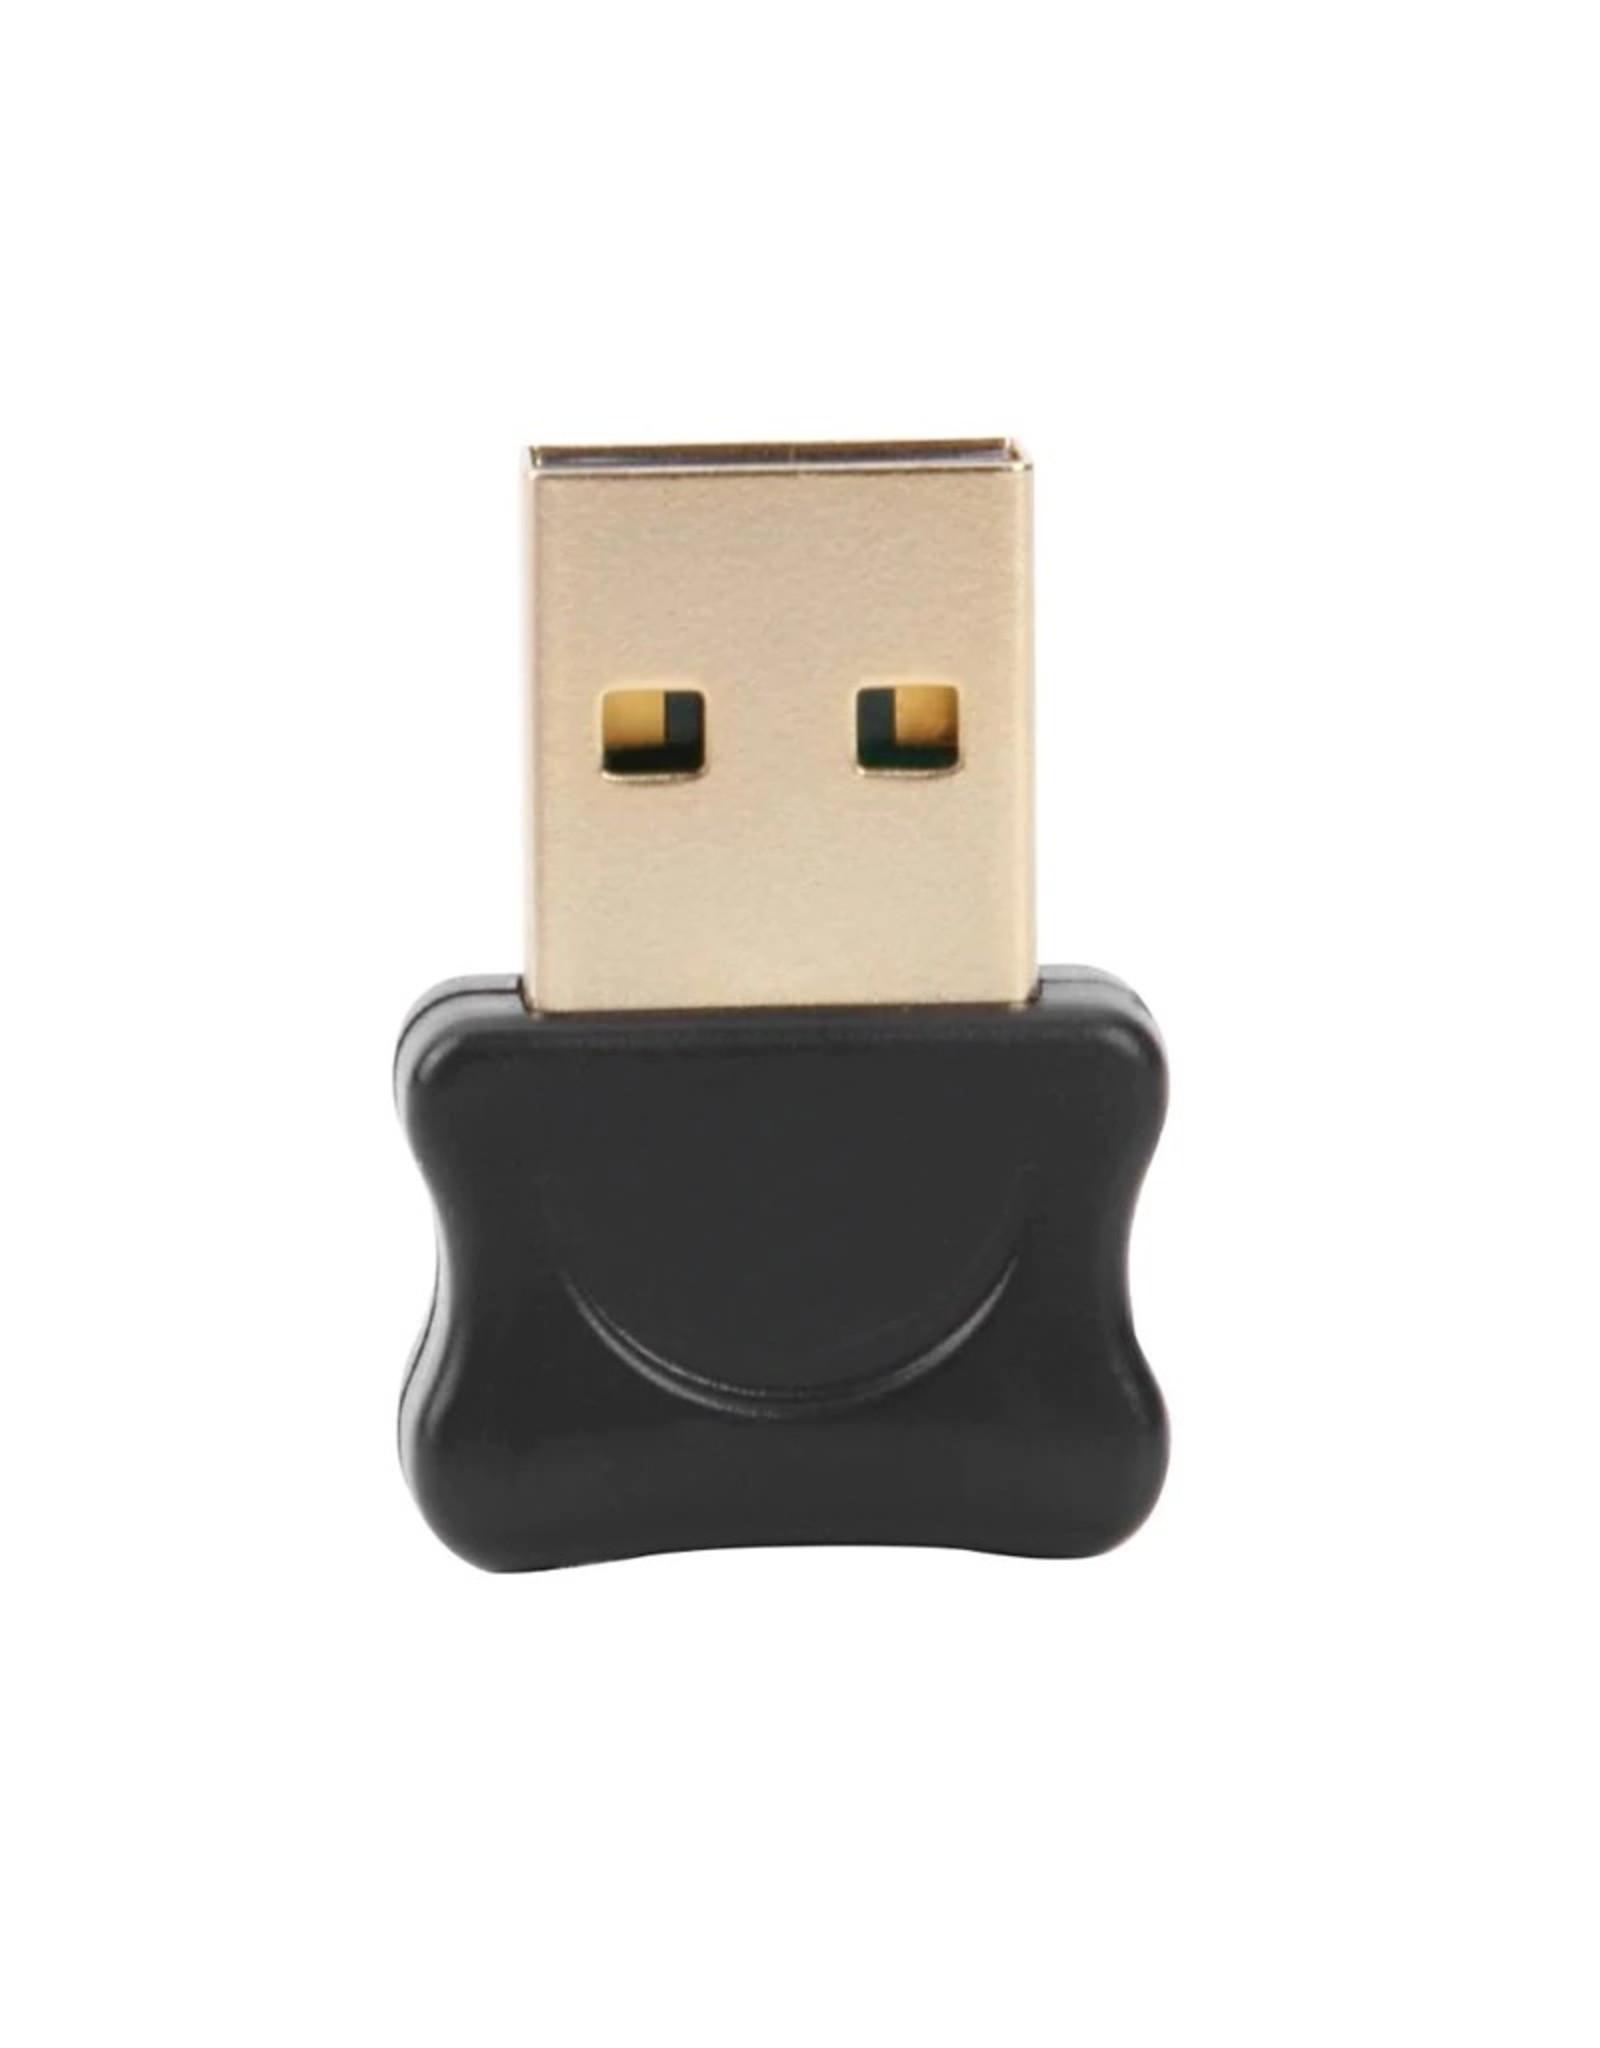 Bluetooth CSR 5.0 Dongle - Mini Bluetooth 5.0 USB Adapter – Dongle - Bluetooth adapter - draadloze dongle - verbind meerdere bluetooth apparaten – Kleur: Zwart